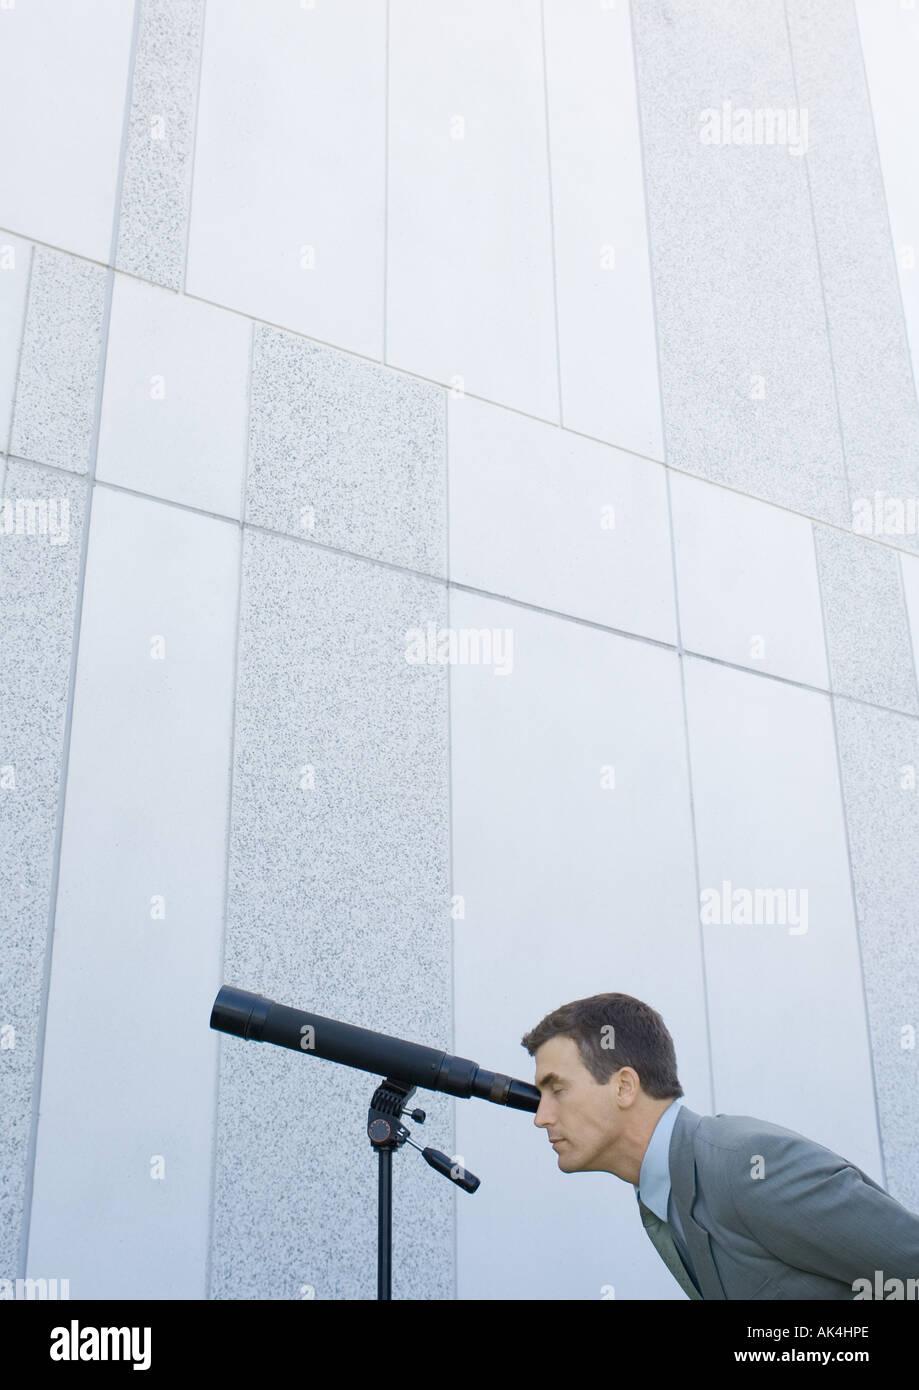 Businessman looking through telescope - Stock Image